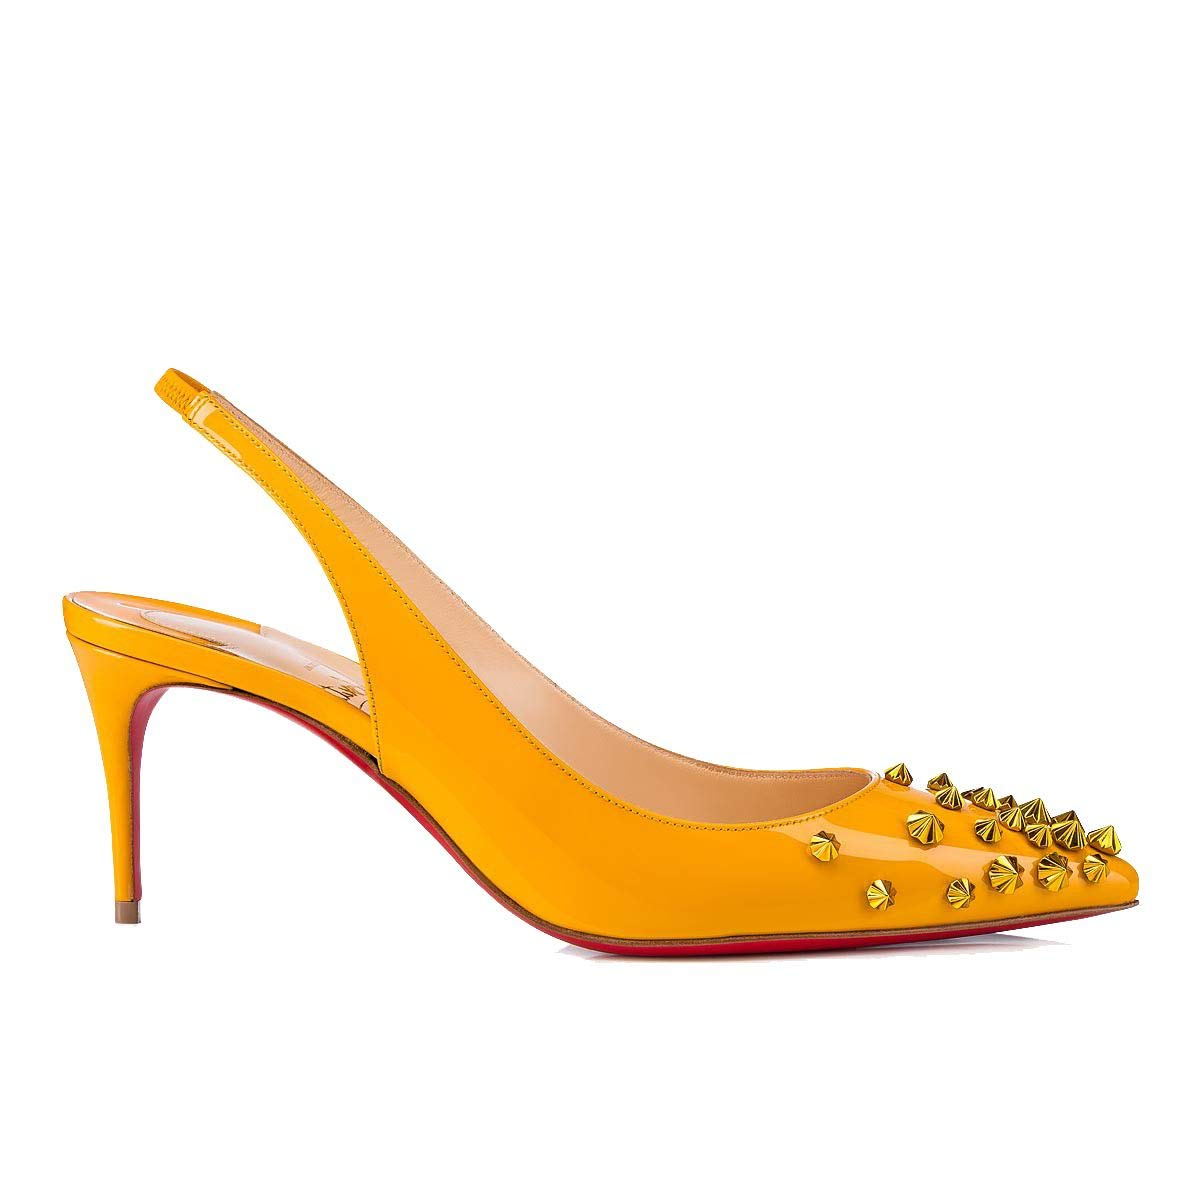 the latest 917c6 a9437 Amazon.com | Christian Louboutin Women's 3180437Y131 Yellow ...